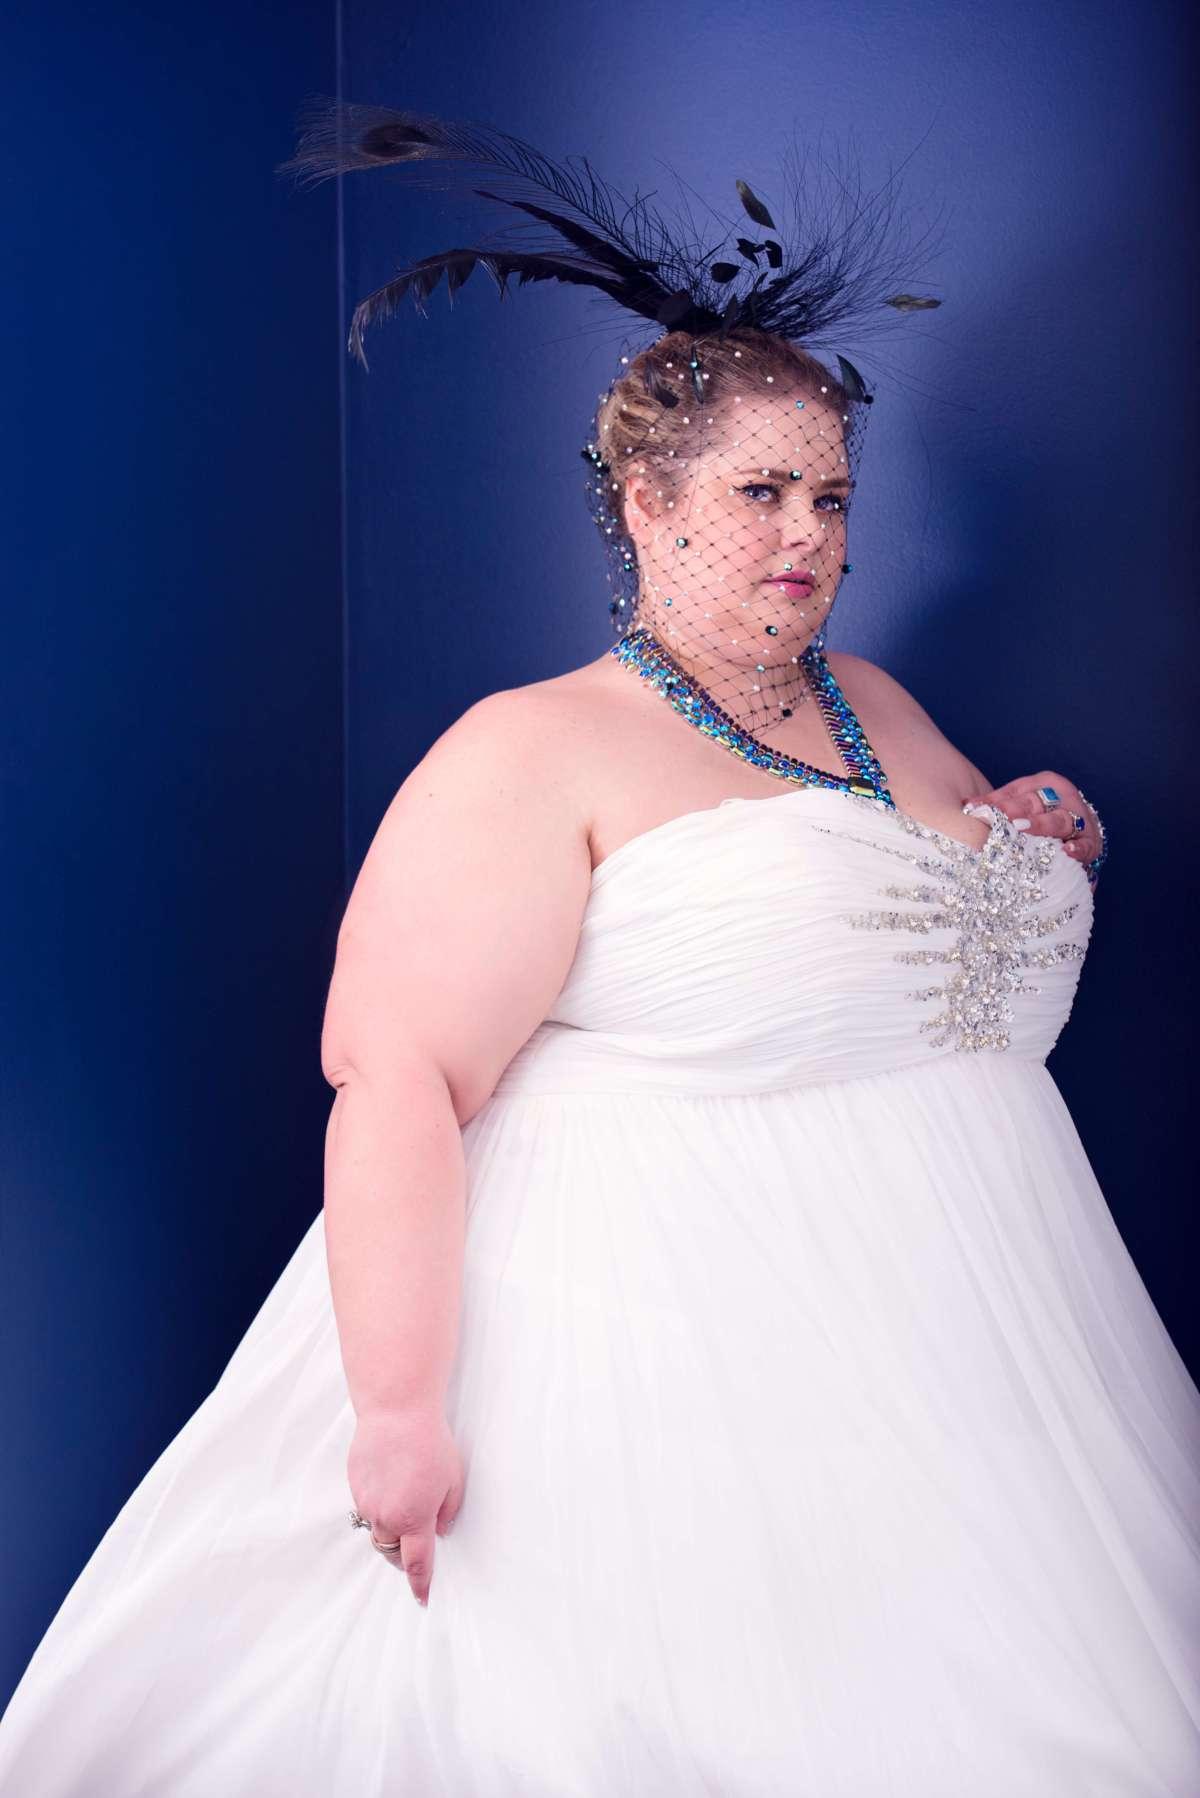 Mustangsallytwo x Sydney's Closet - Starburst Dress